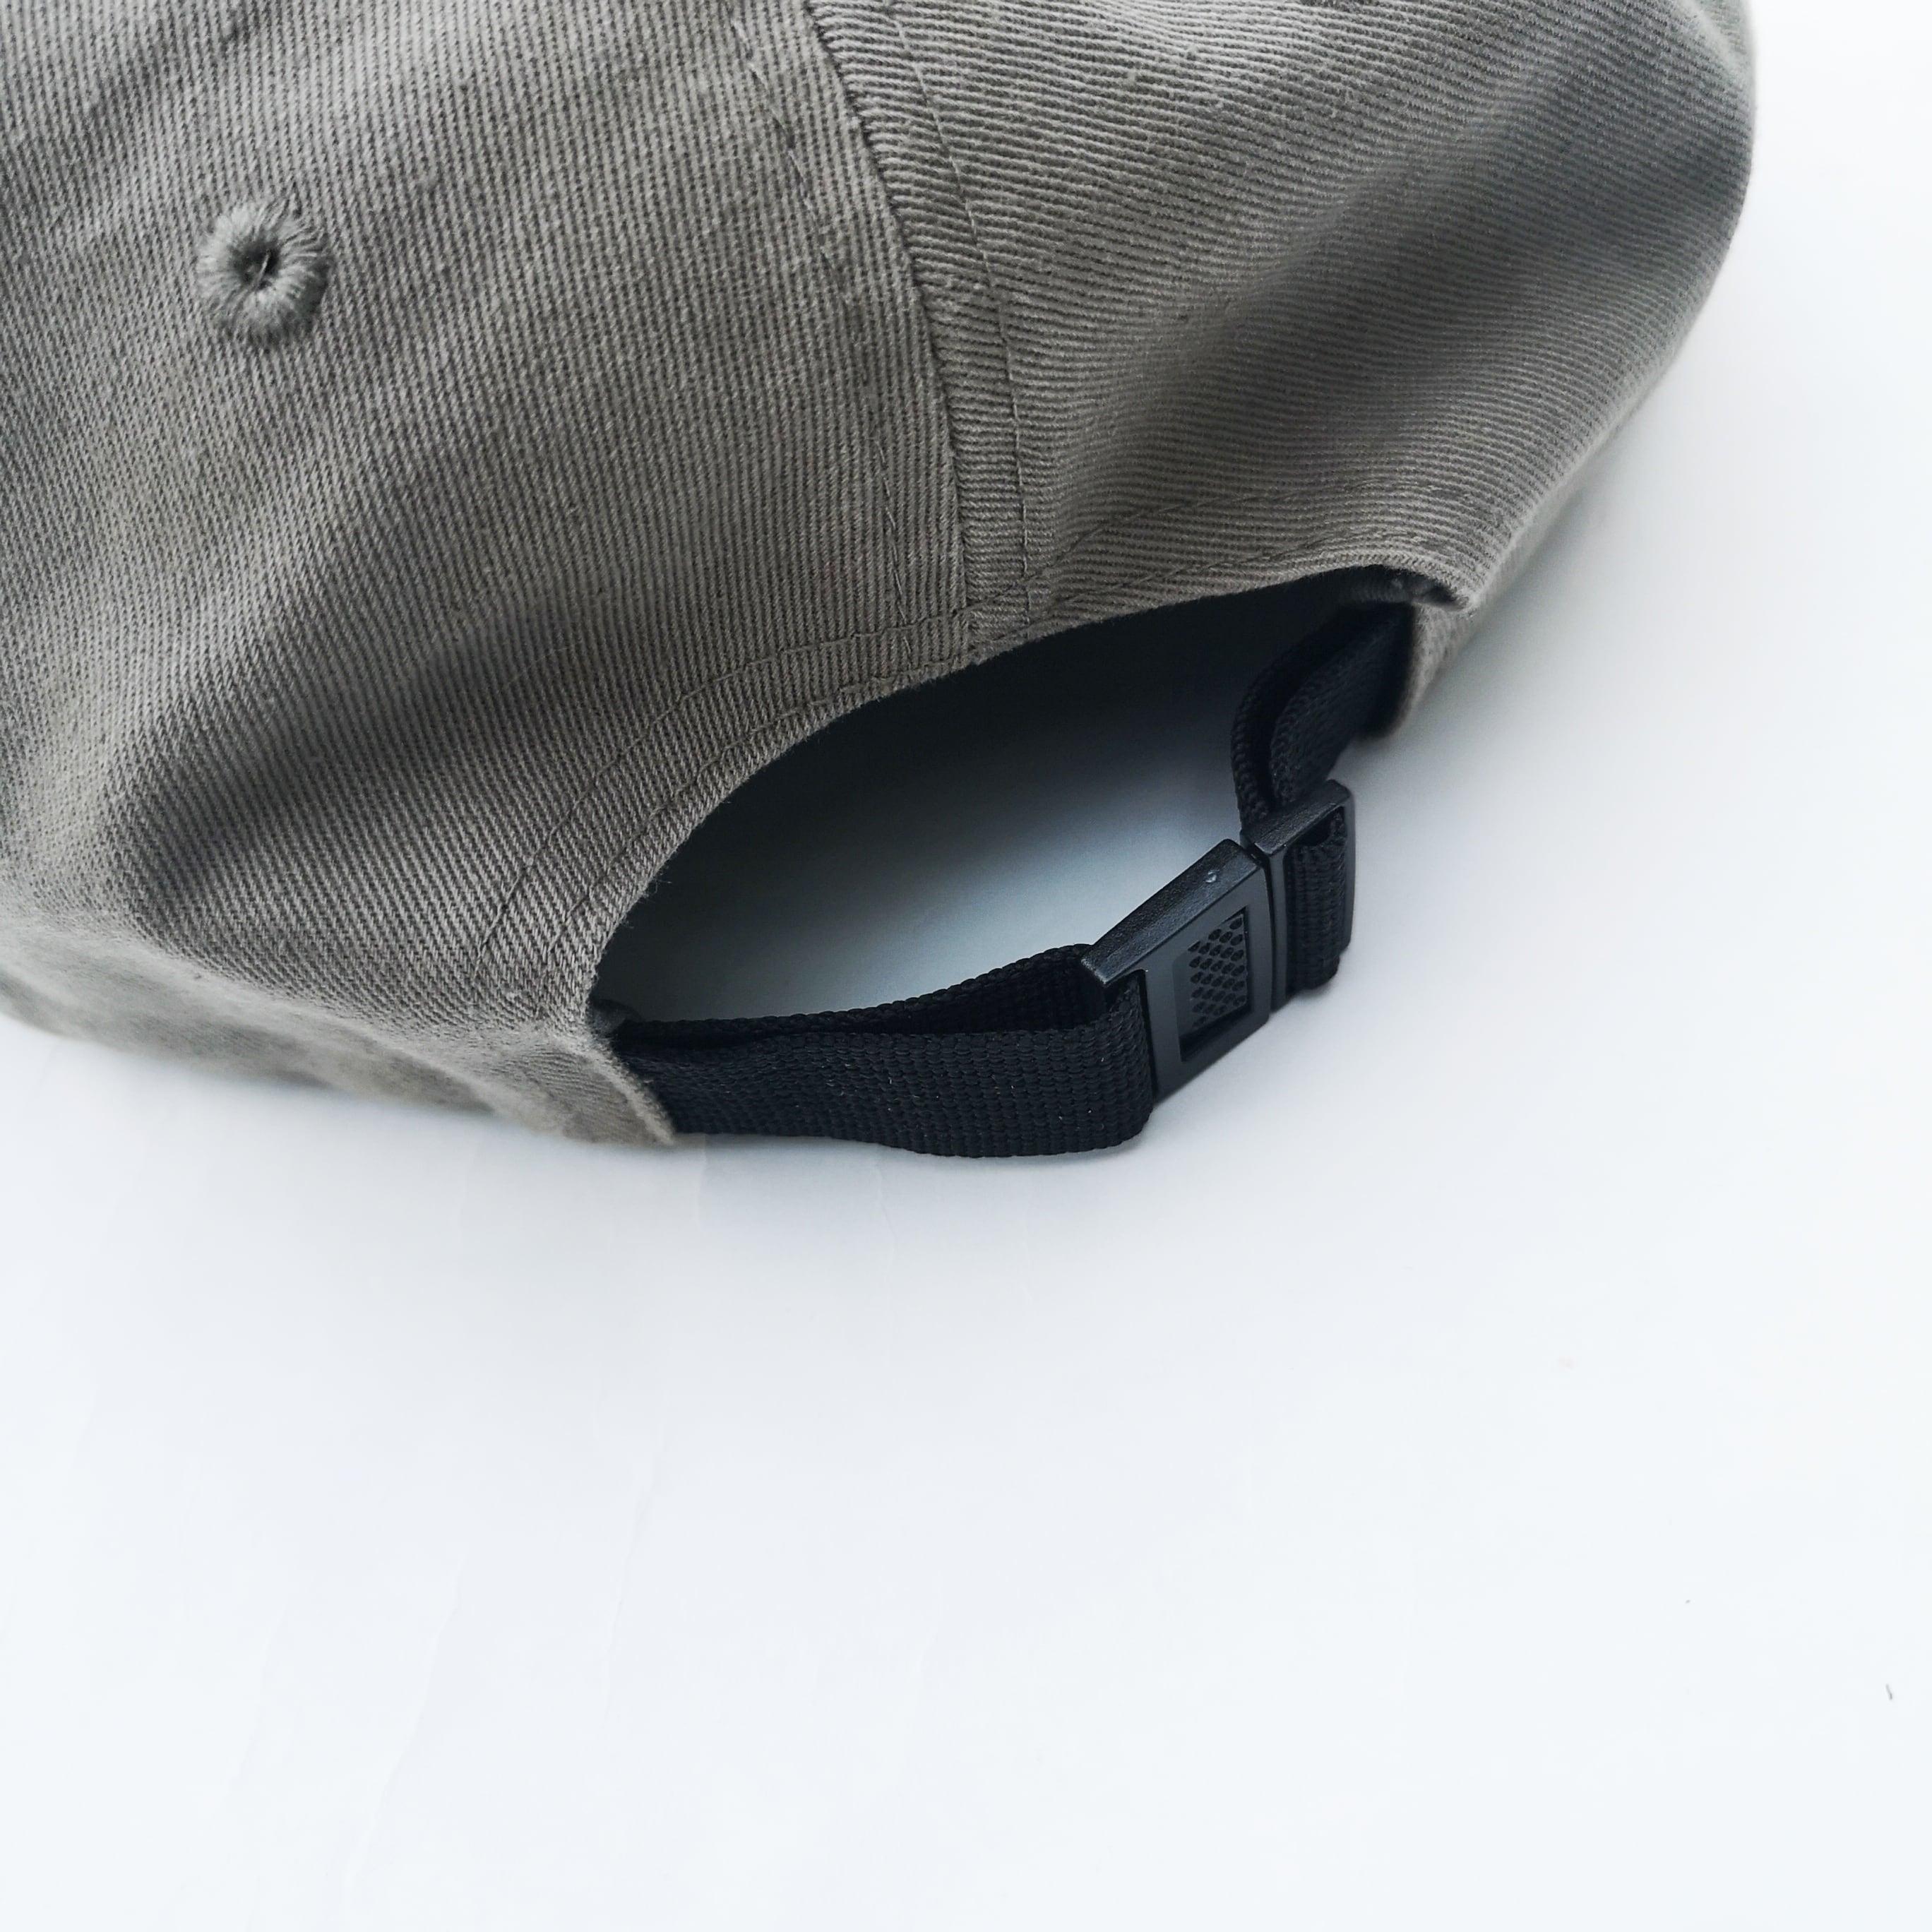 MSX BANDITS CAP YELLOW, GRAY, BLACK